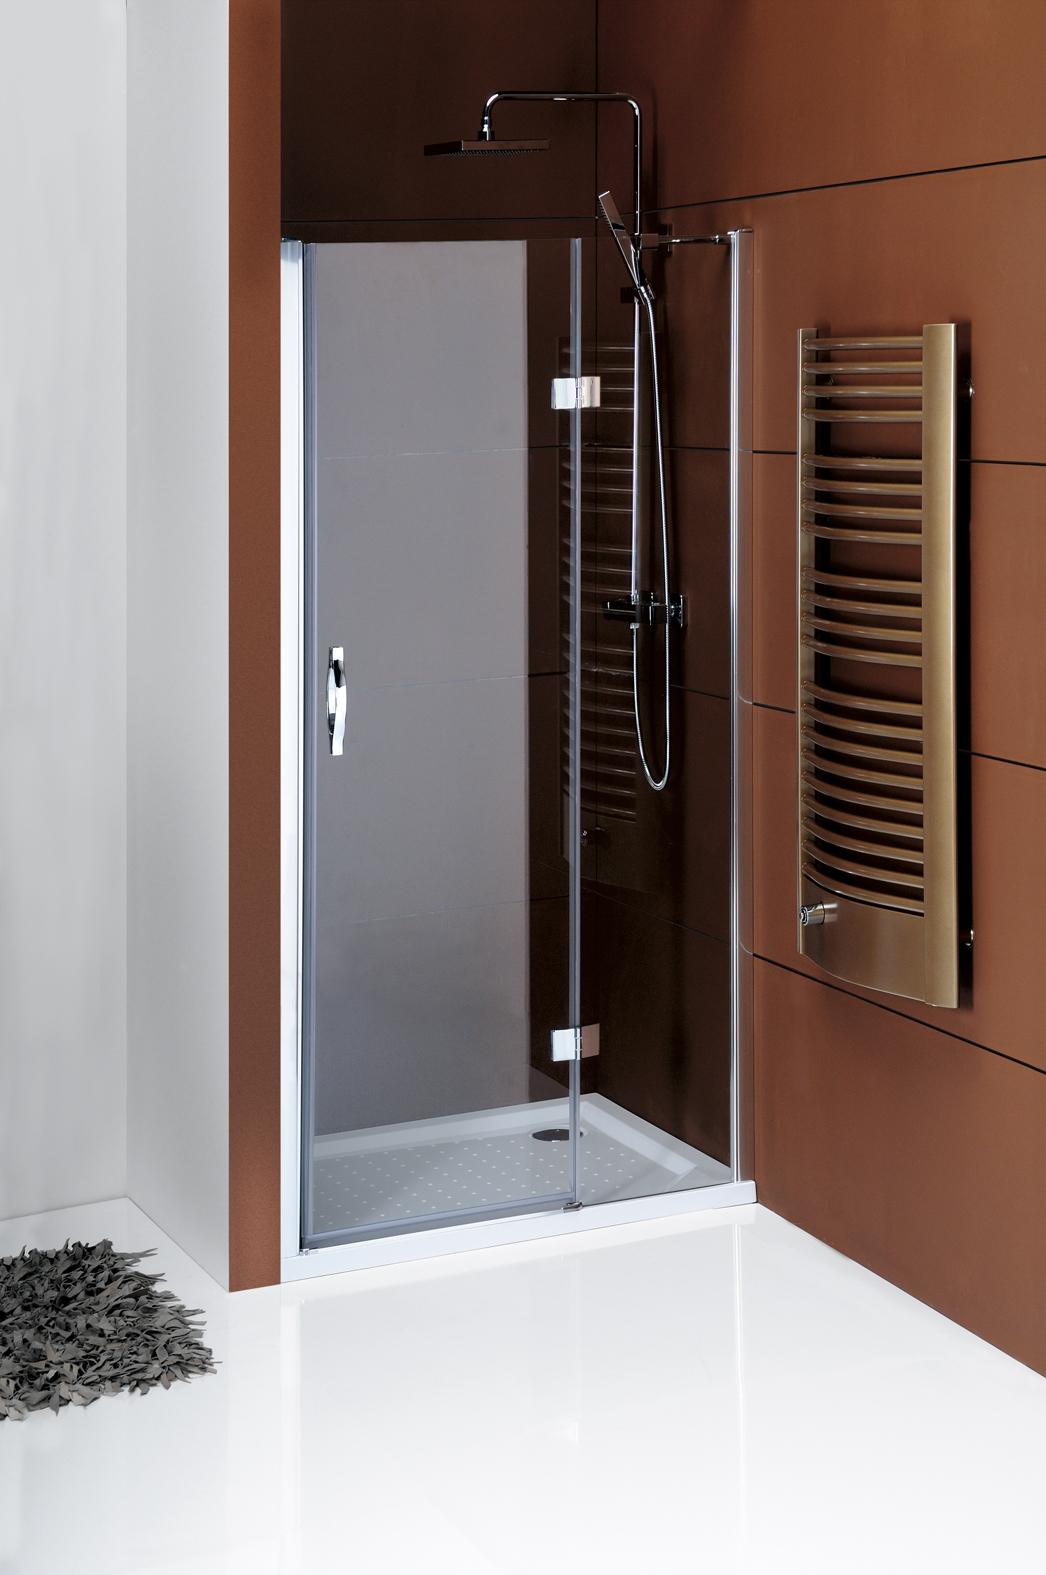 Gelco Sprchové dveře Legro do niky jednodílné otočné 80 cm, sklo čiré/leštěný profil GL1280